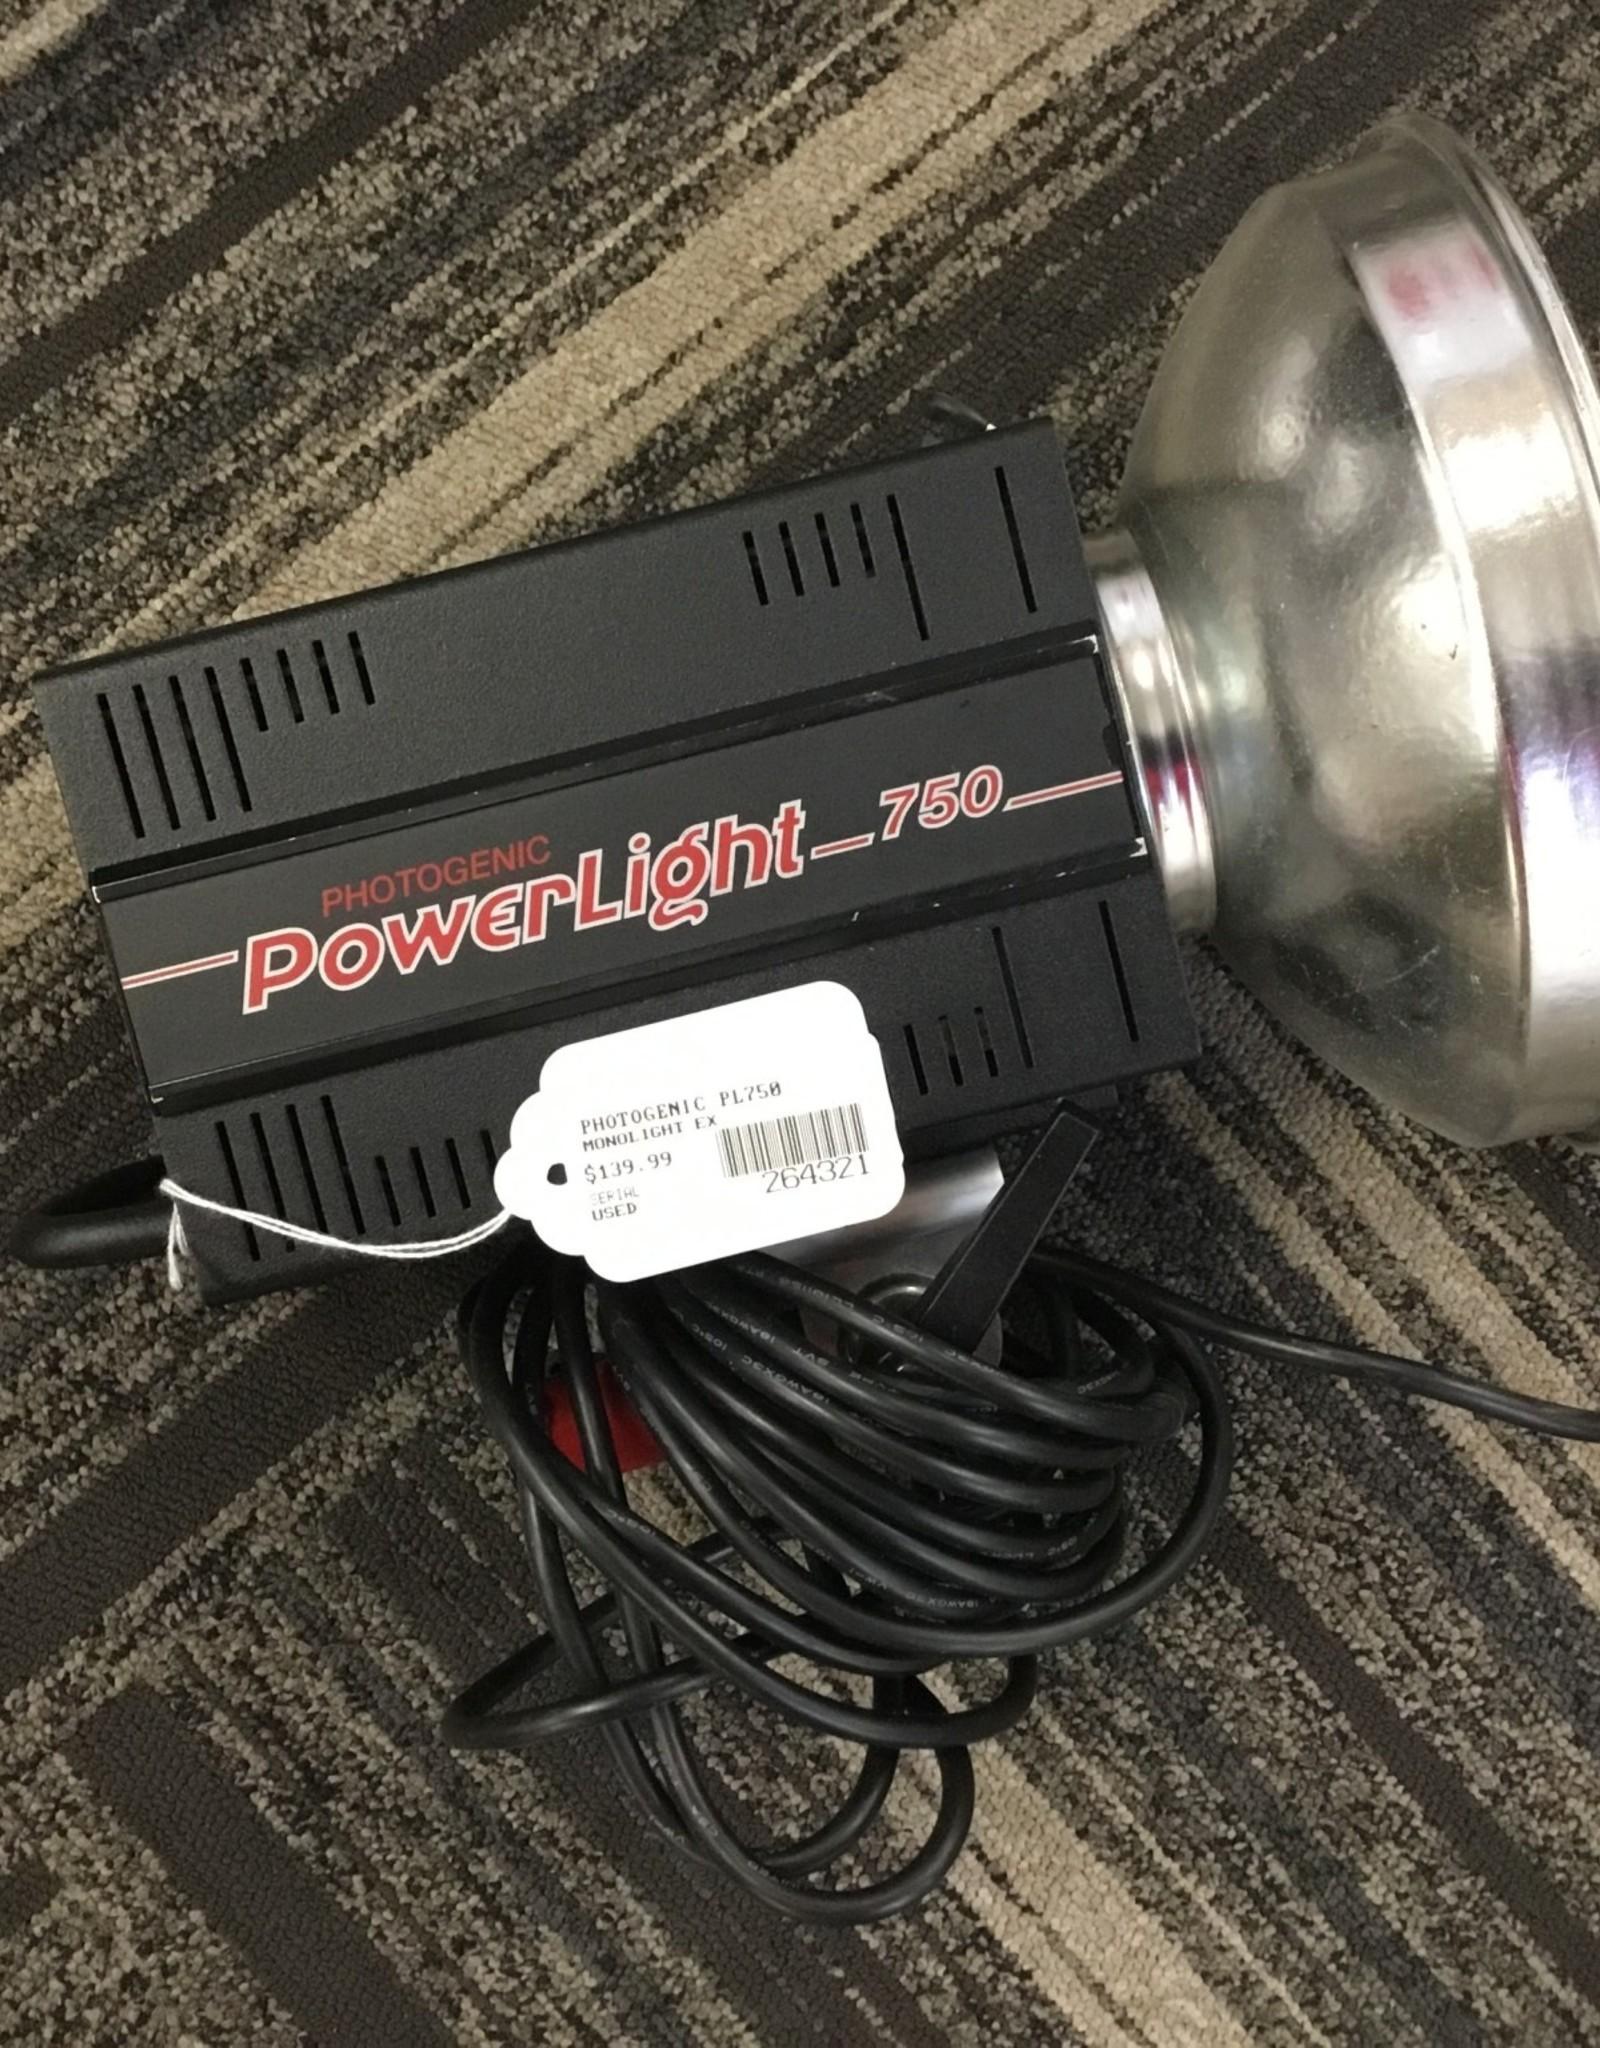 Photogenic PL750 monolight used ex